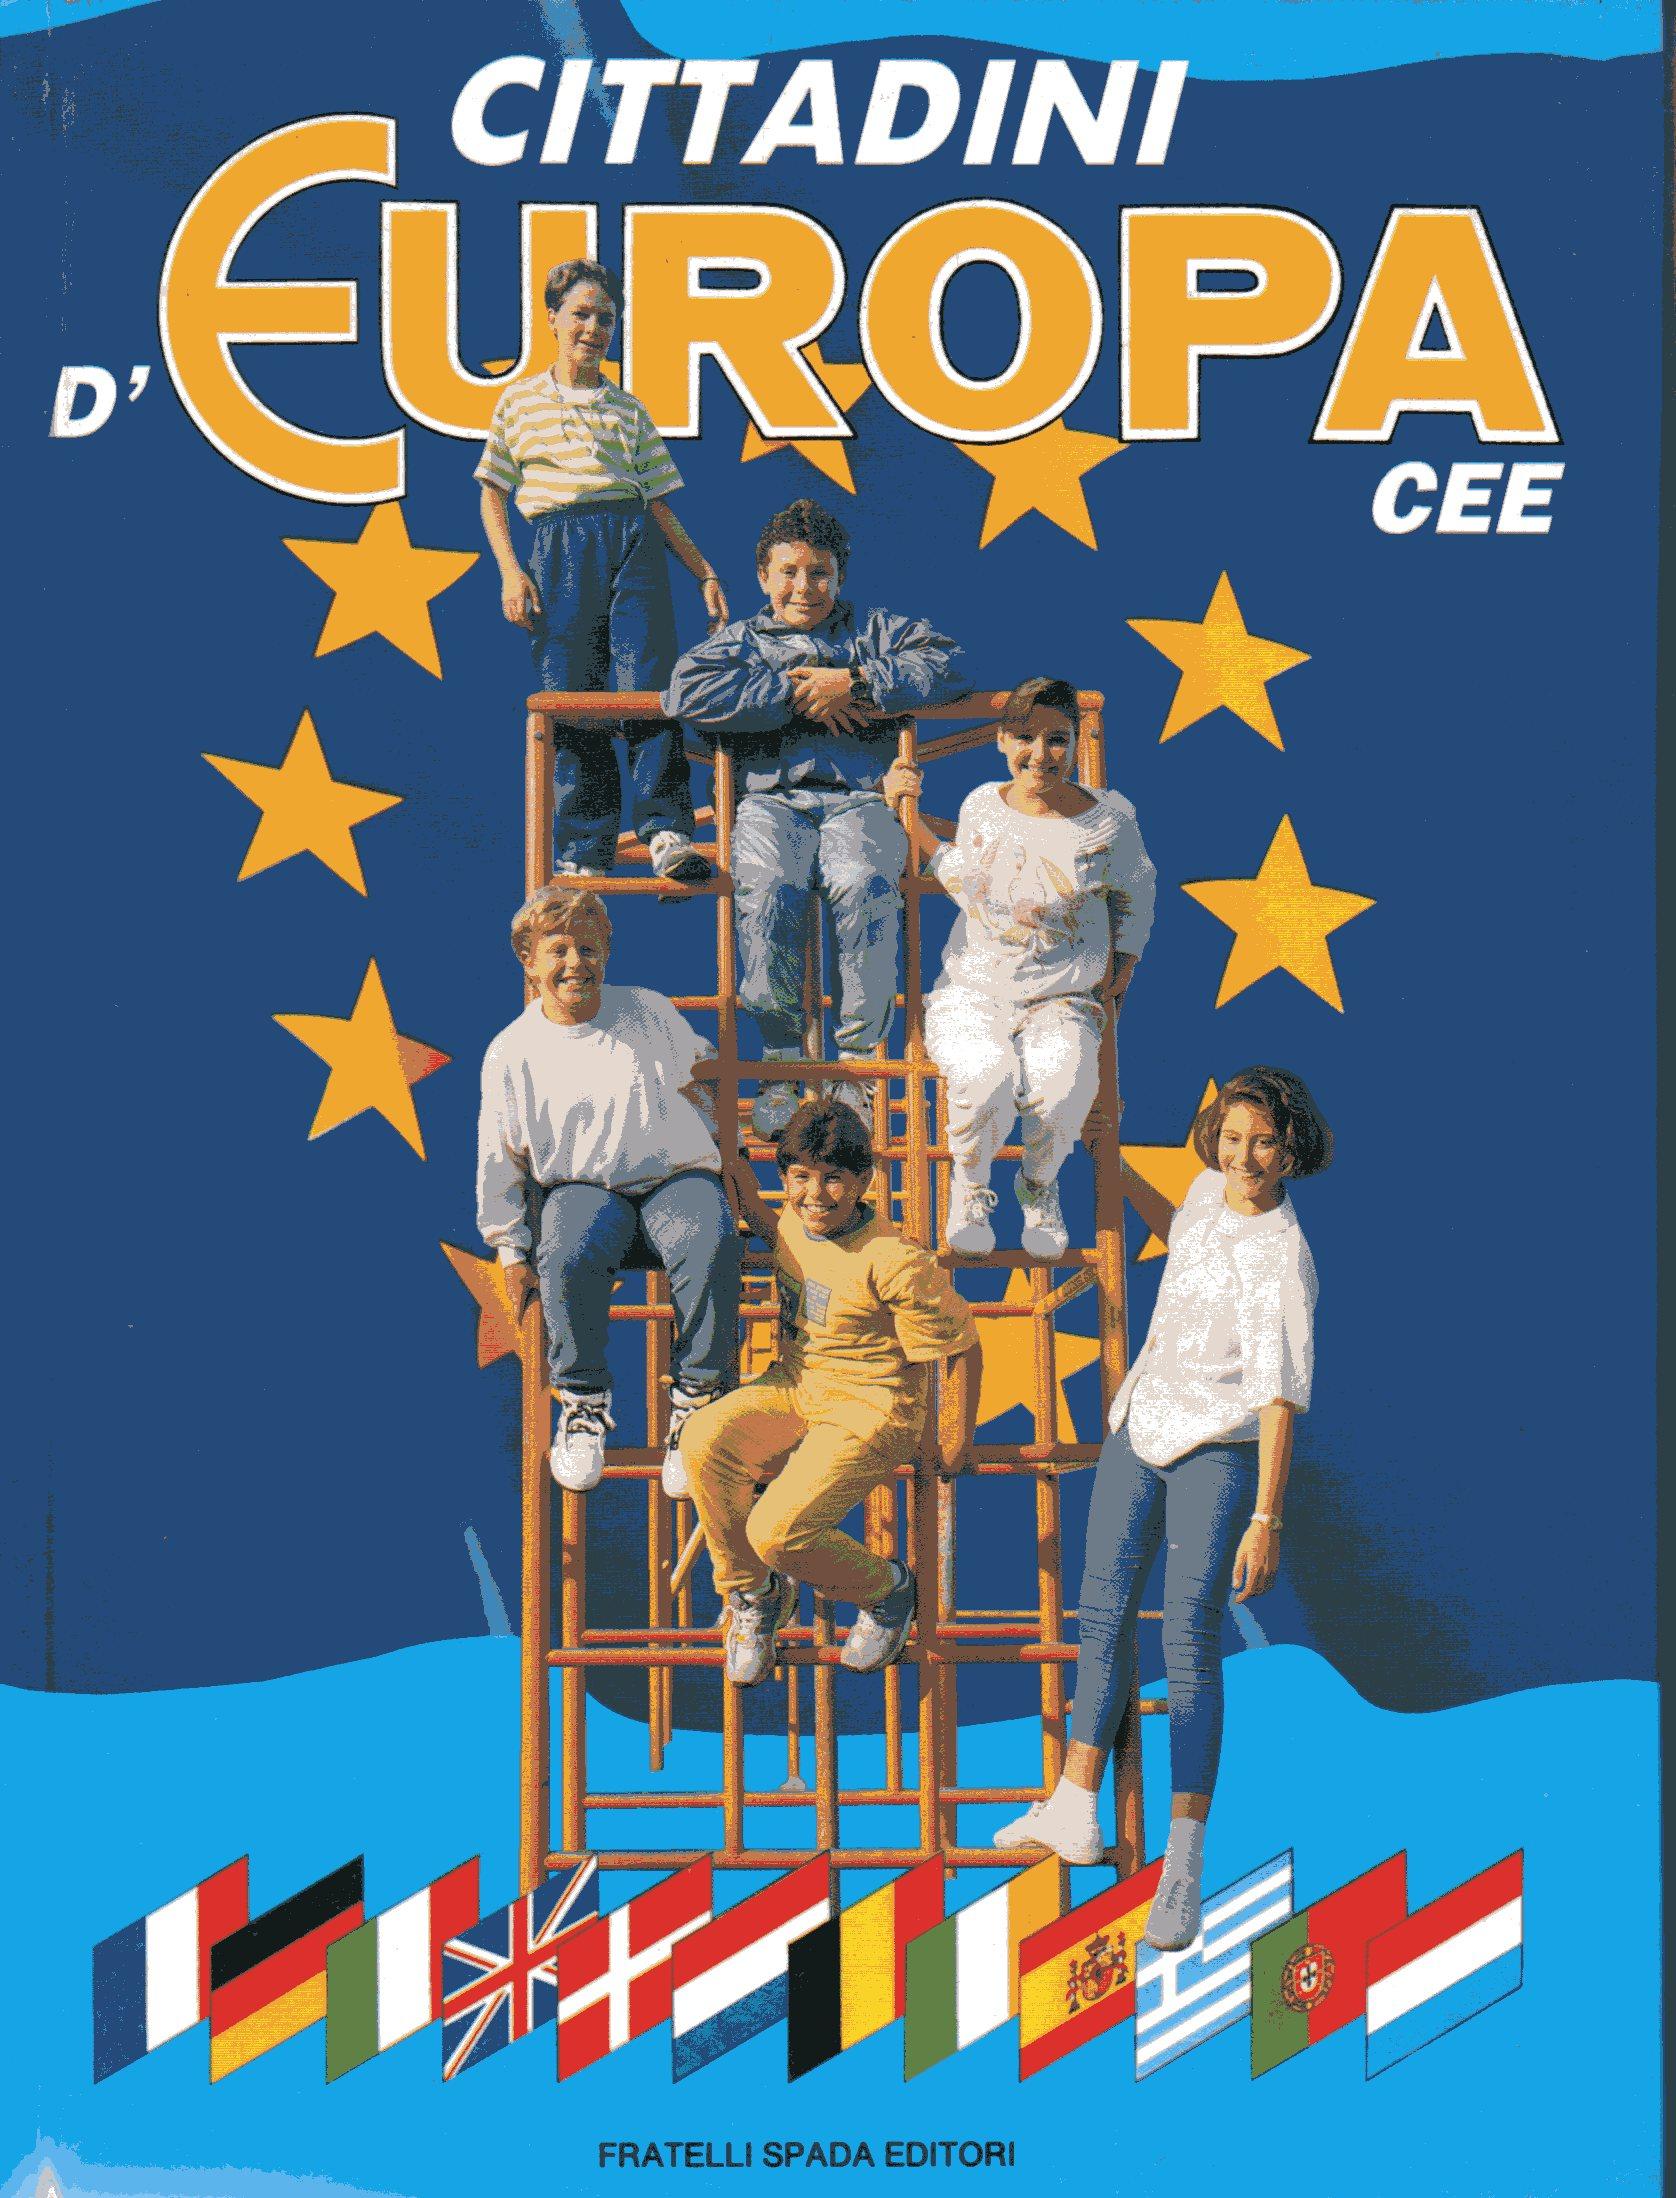 Cittadini d'Europa CEE